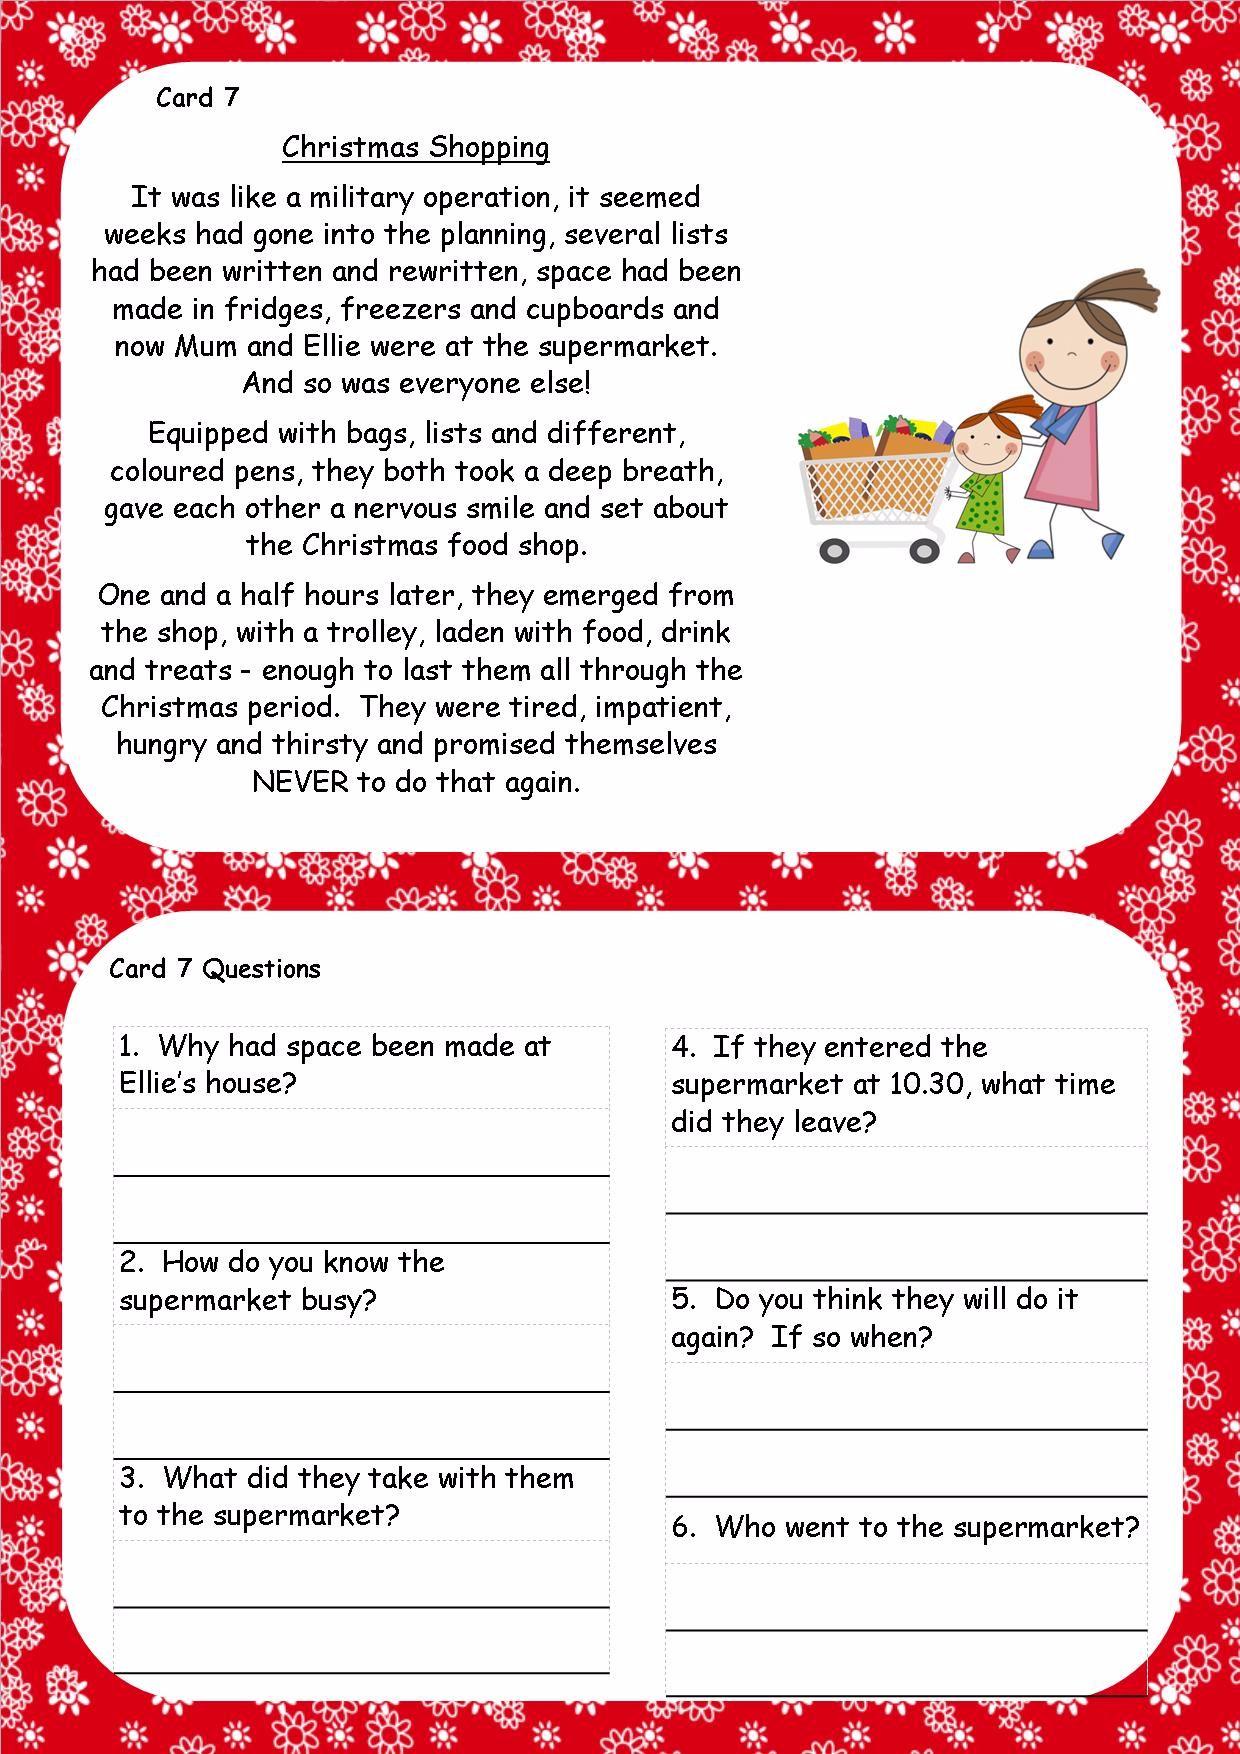 KS1 KS2 SEN IPC Christmas SPAG Activity Booklets